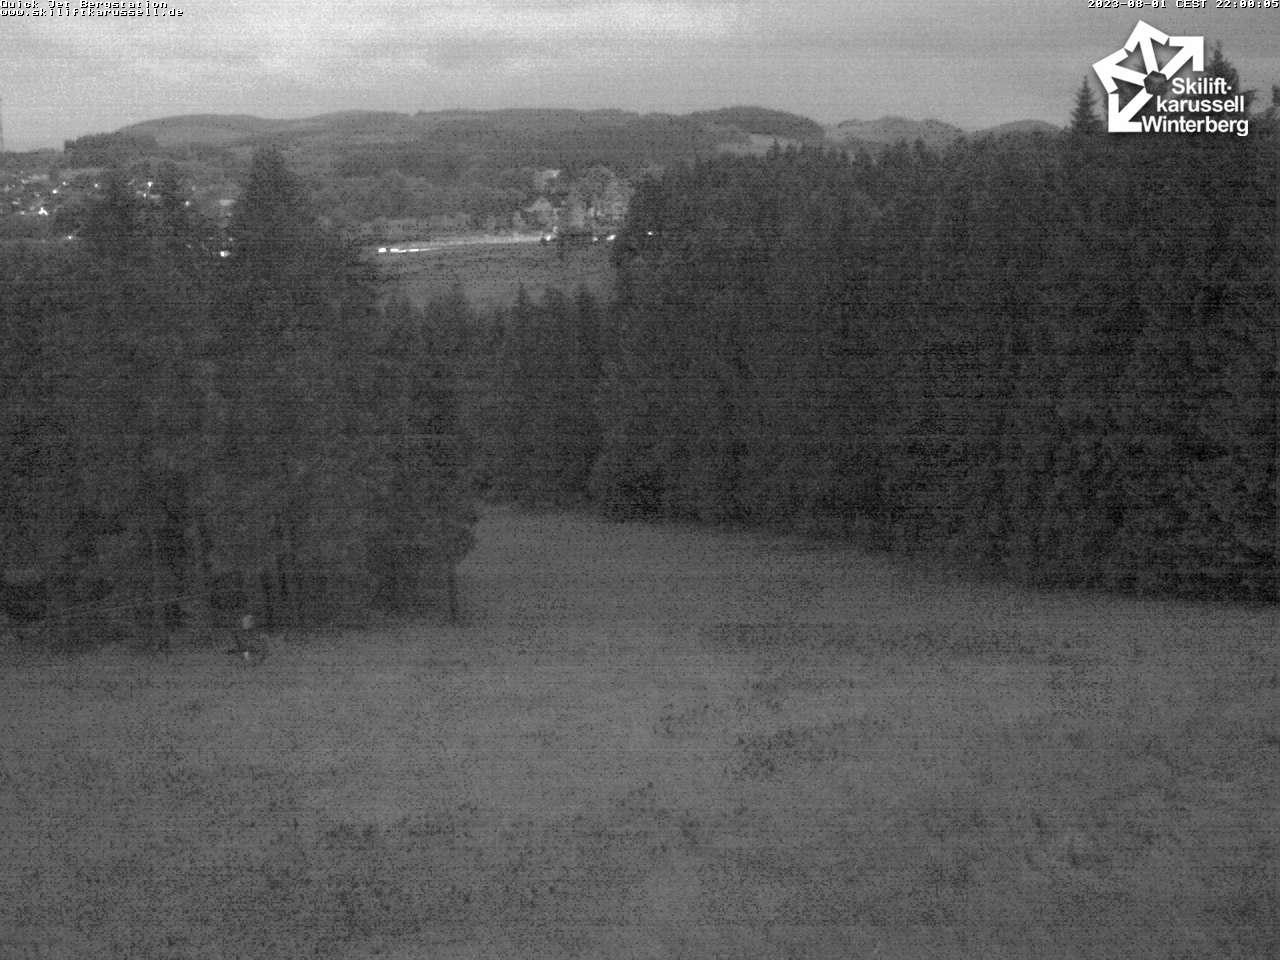 Webcam Quick Jet Bergstation - Skiliftkarussell Winterberg